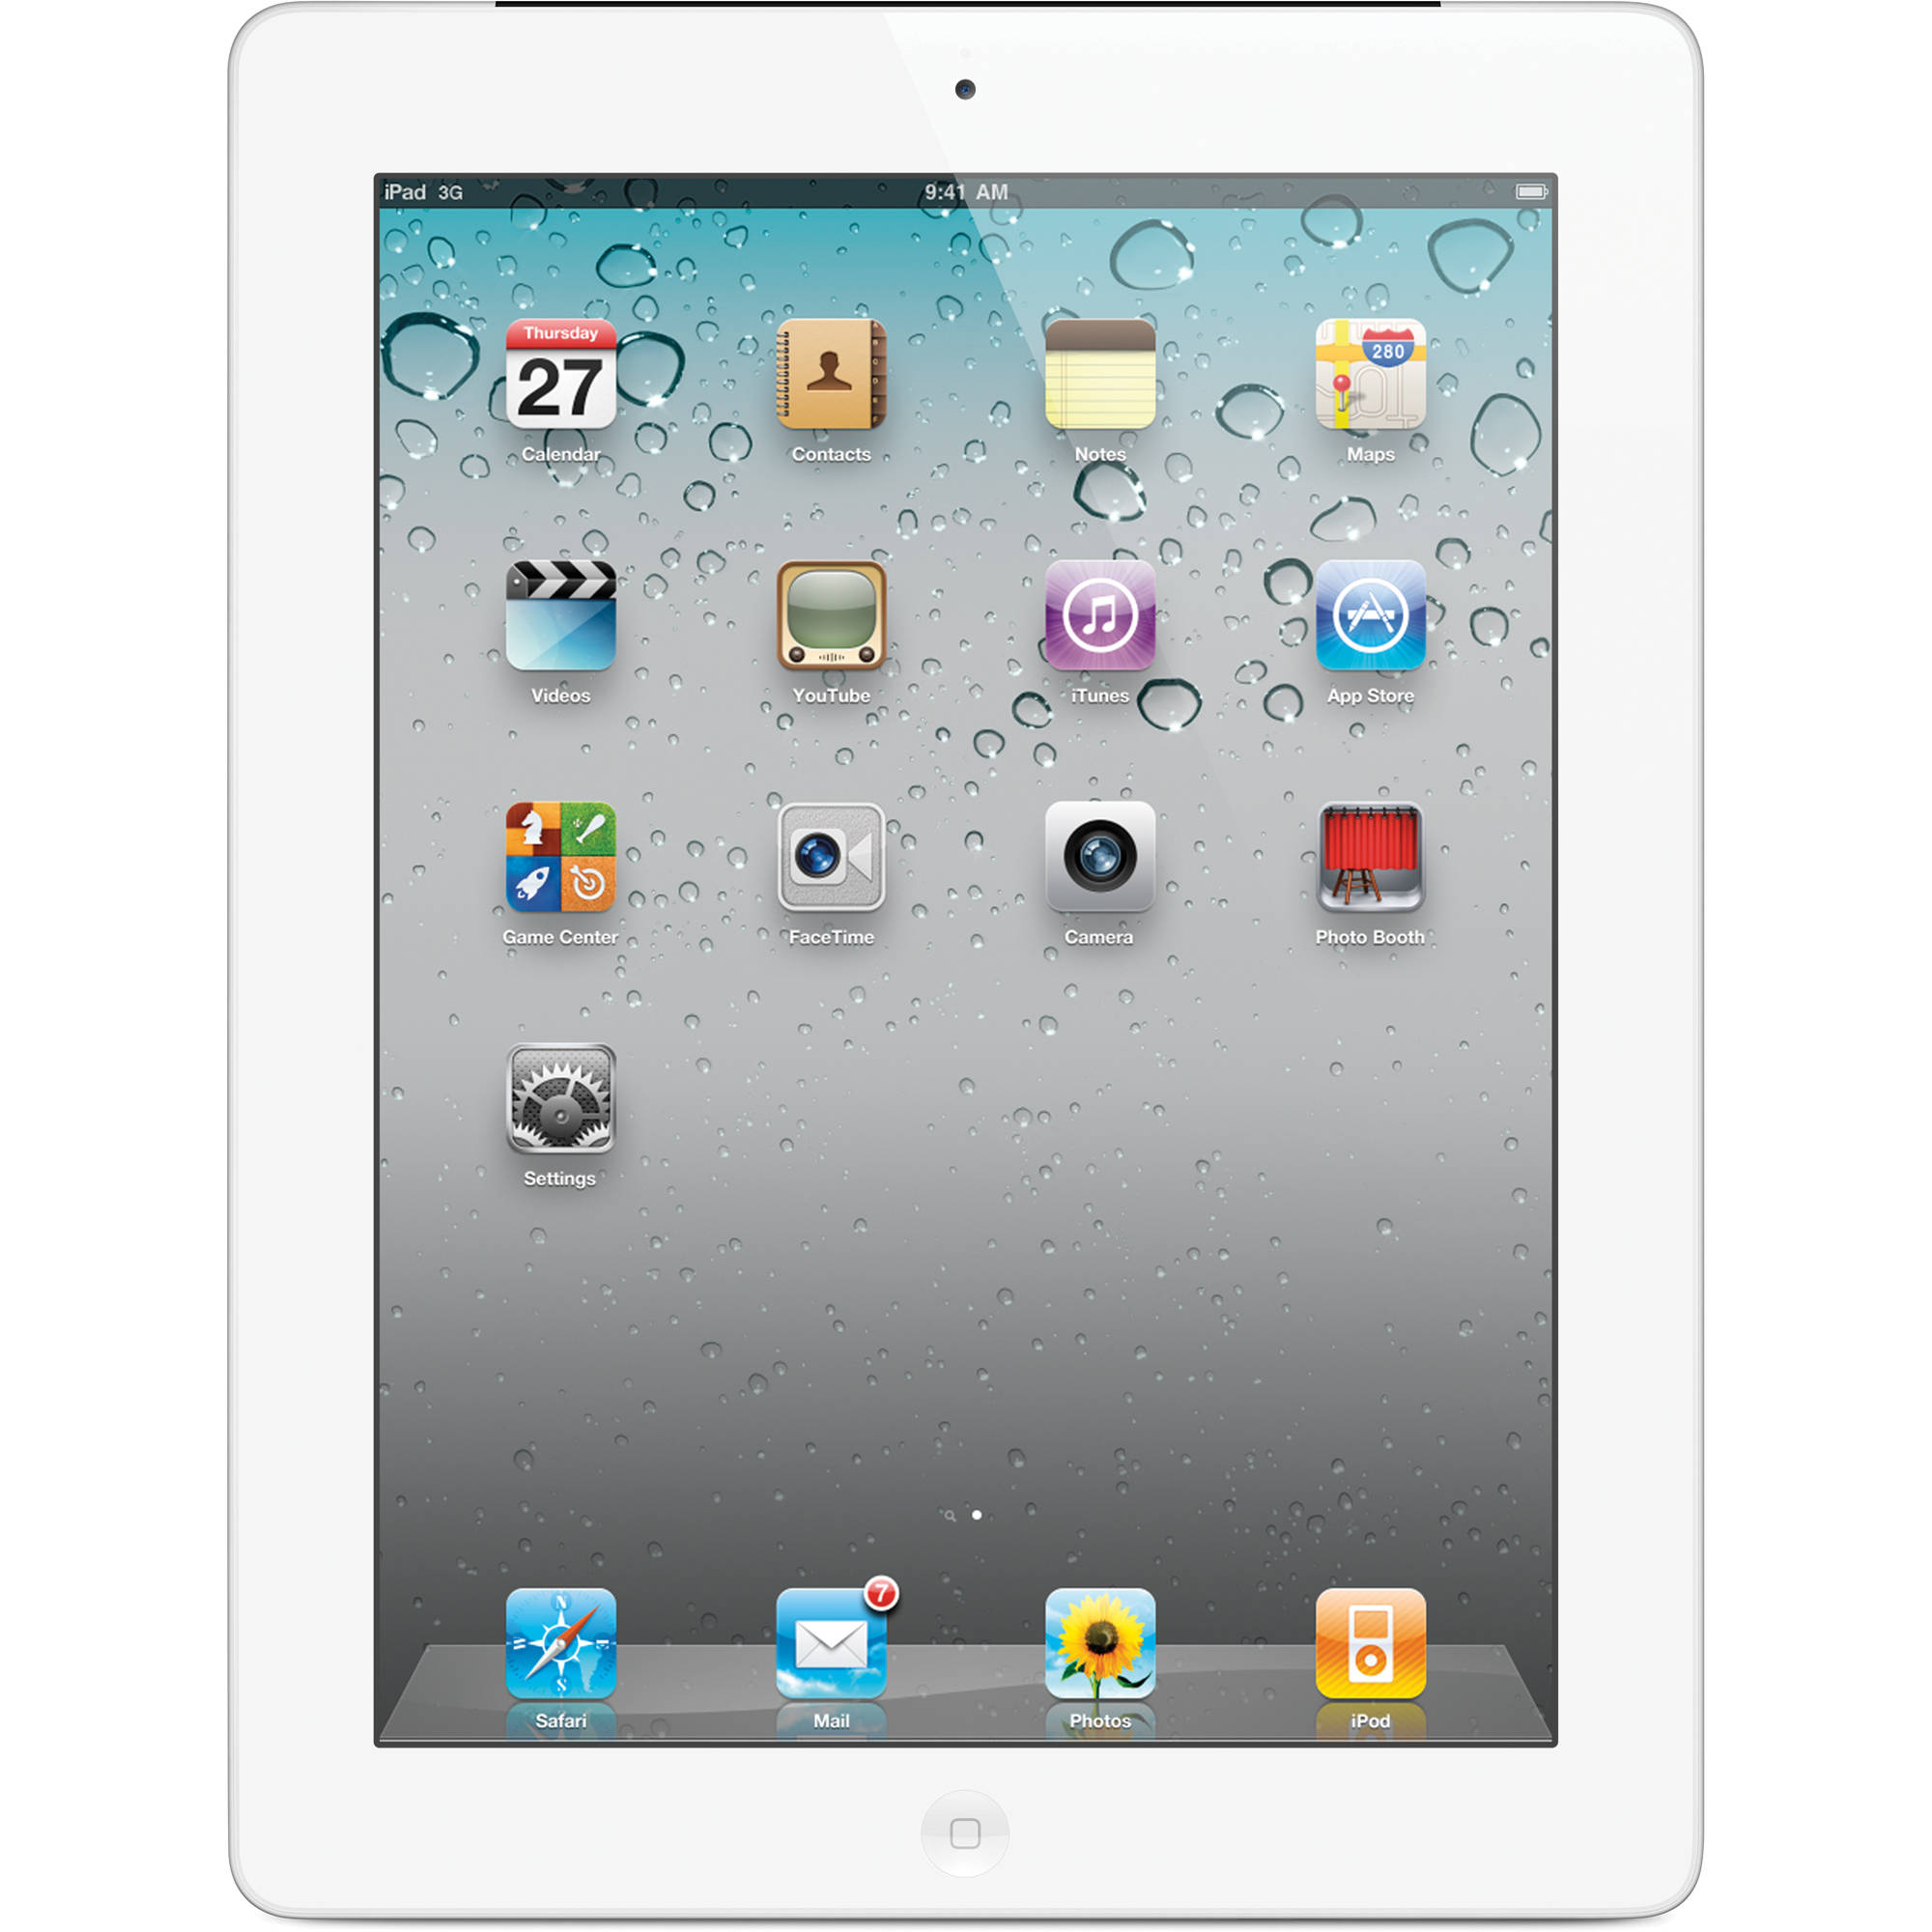 16G iPad 3 or 32G iPad 2? - Apple Community